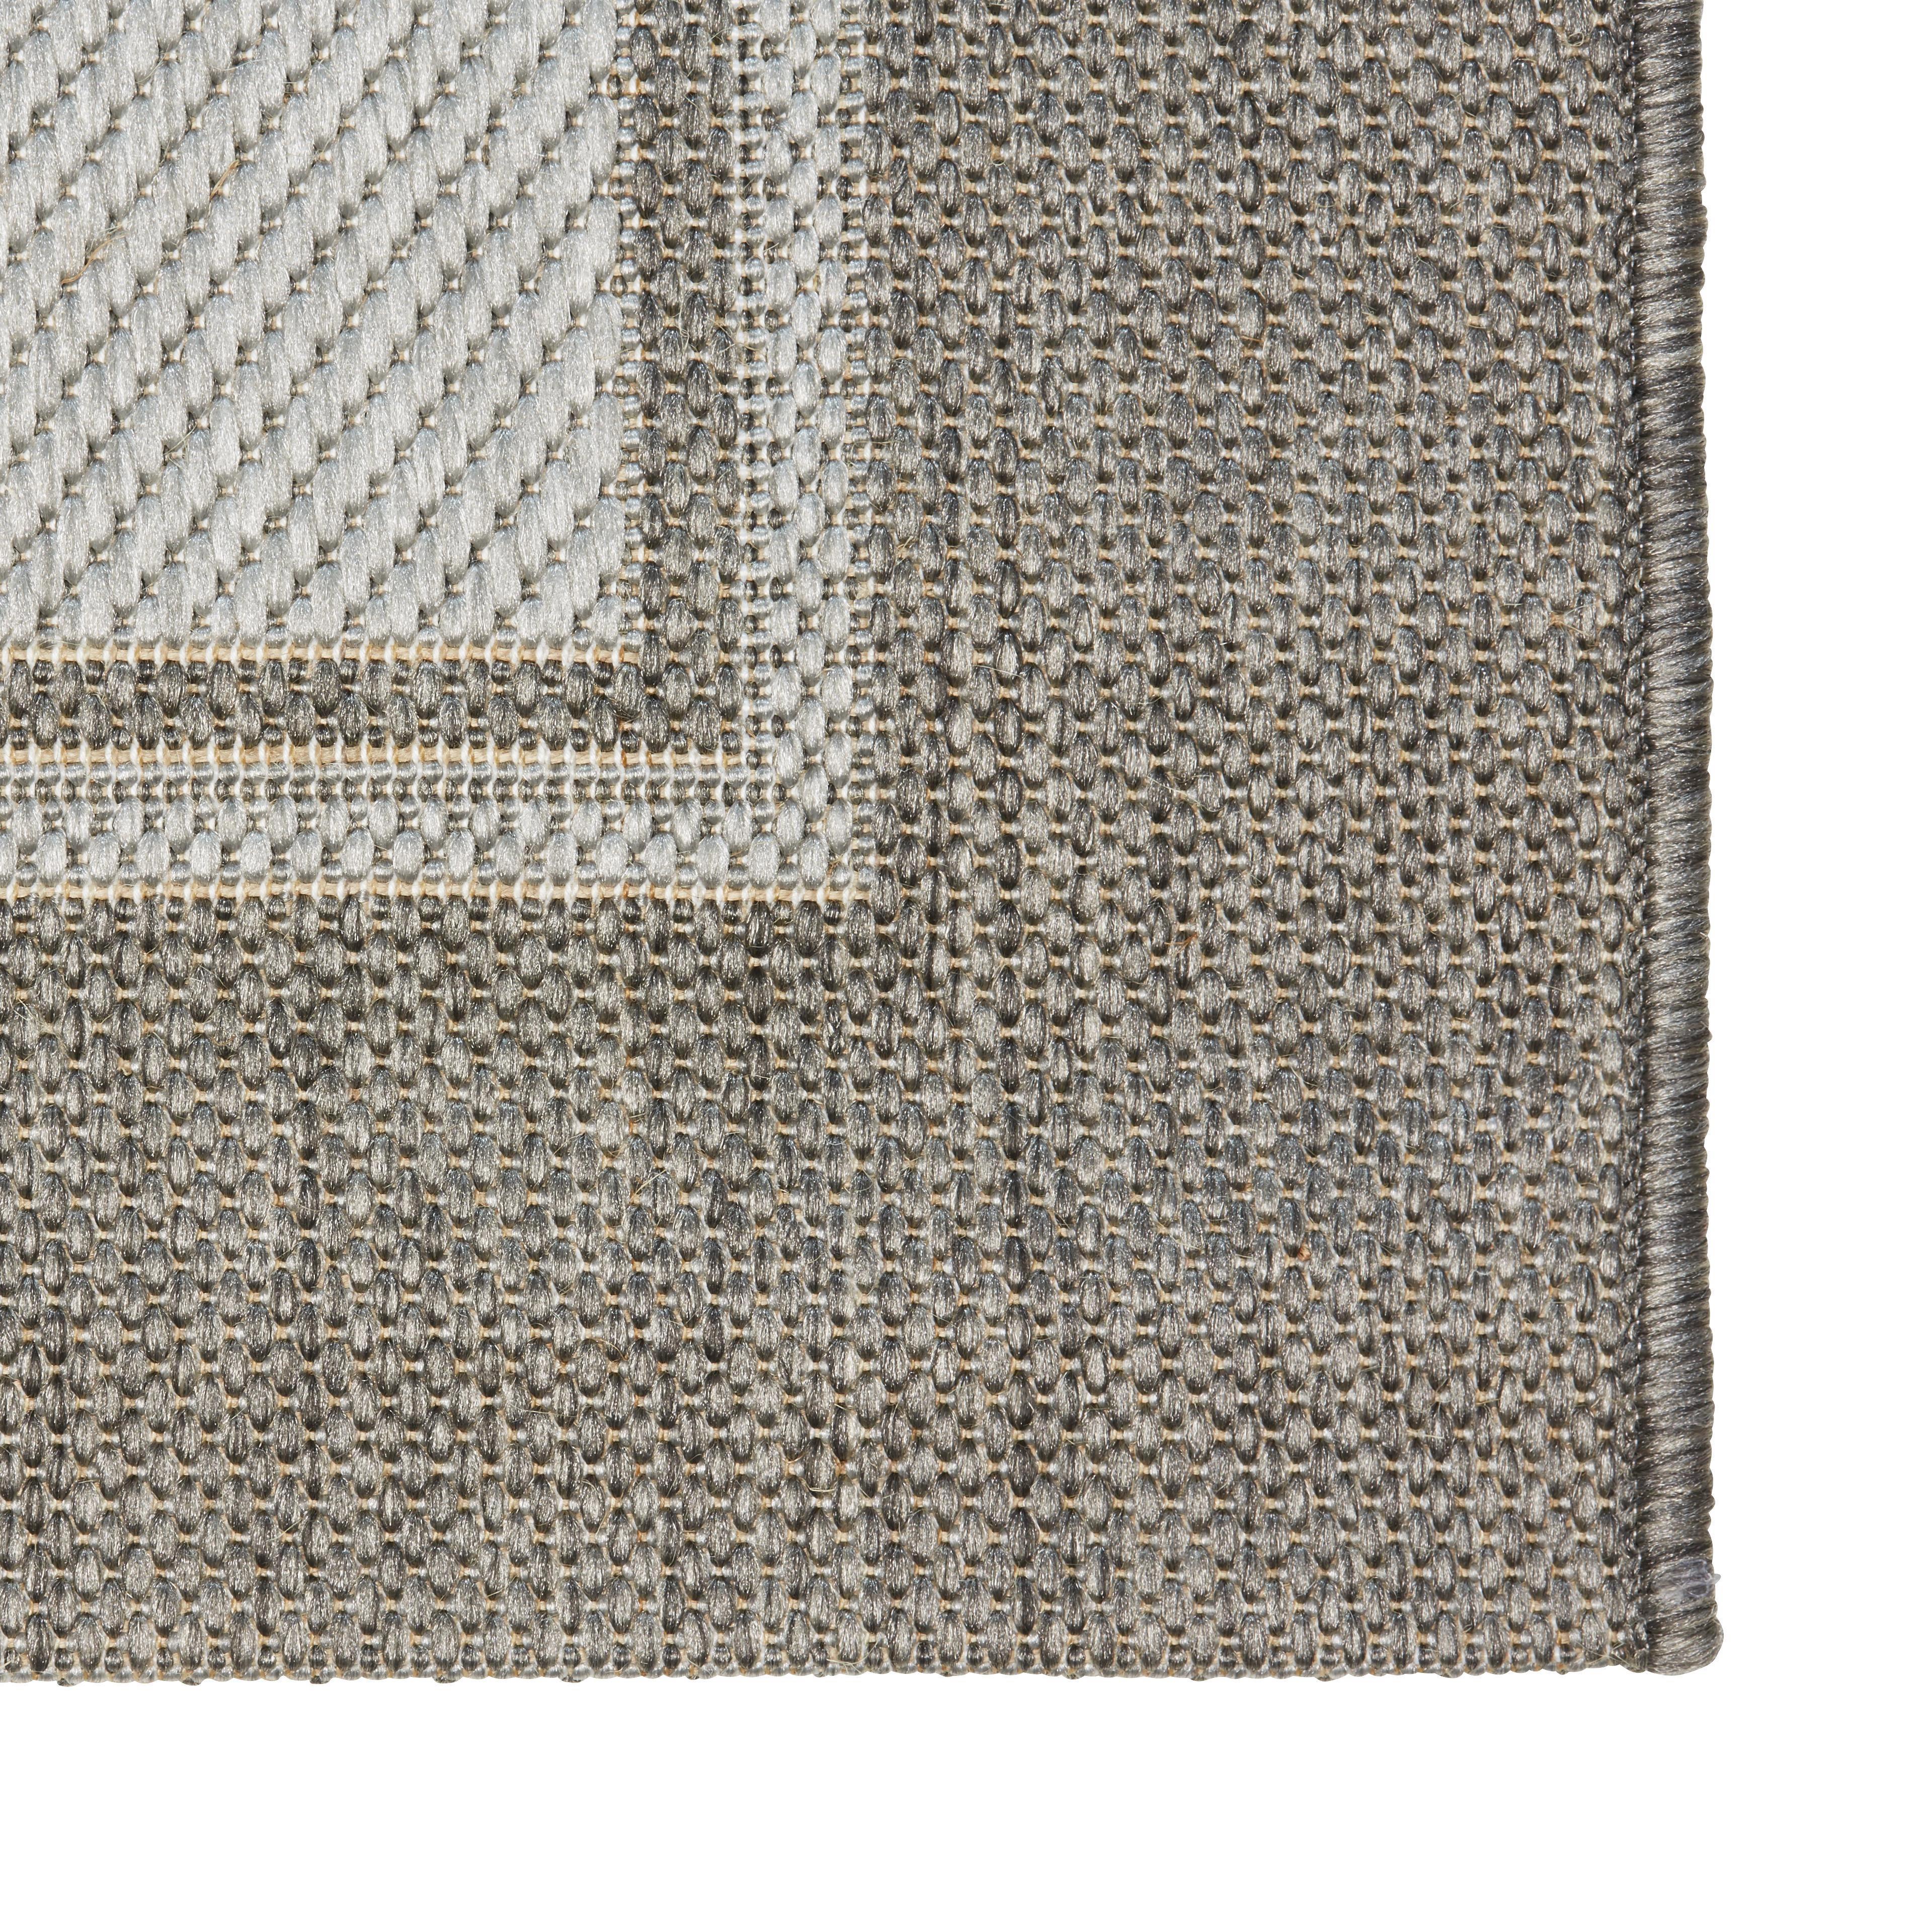 Flachwebeteppich Naomi, ca. 100x150cm - Beige/Grau, KONVENTIONELL, Textil (100/150cm) - BASED